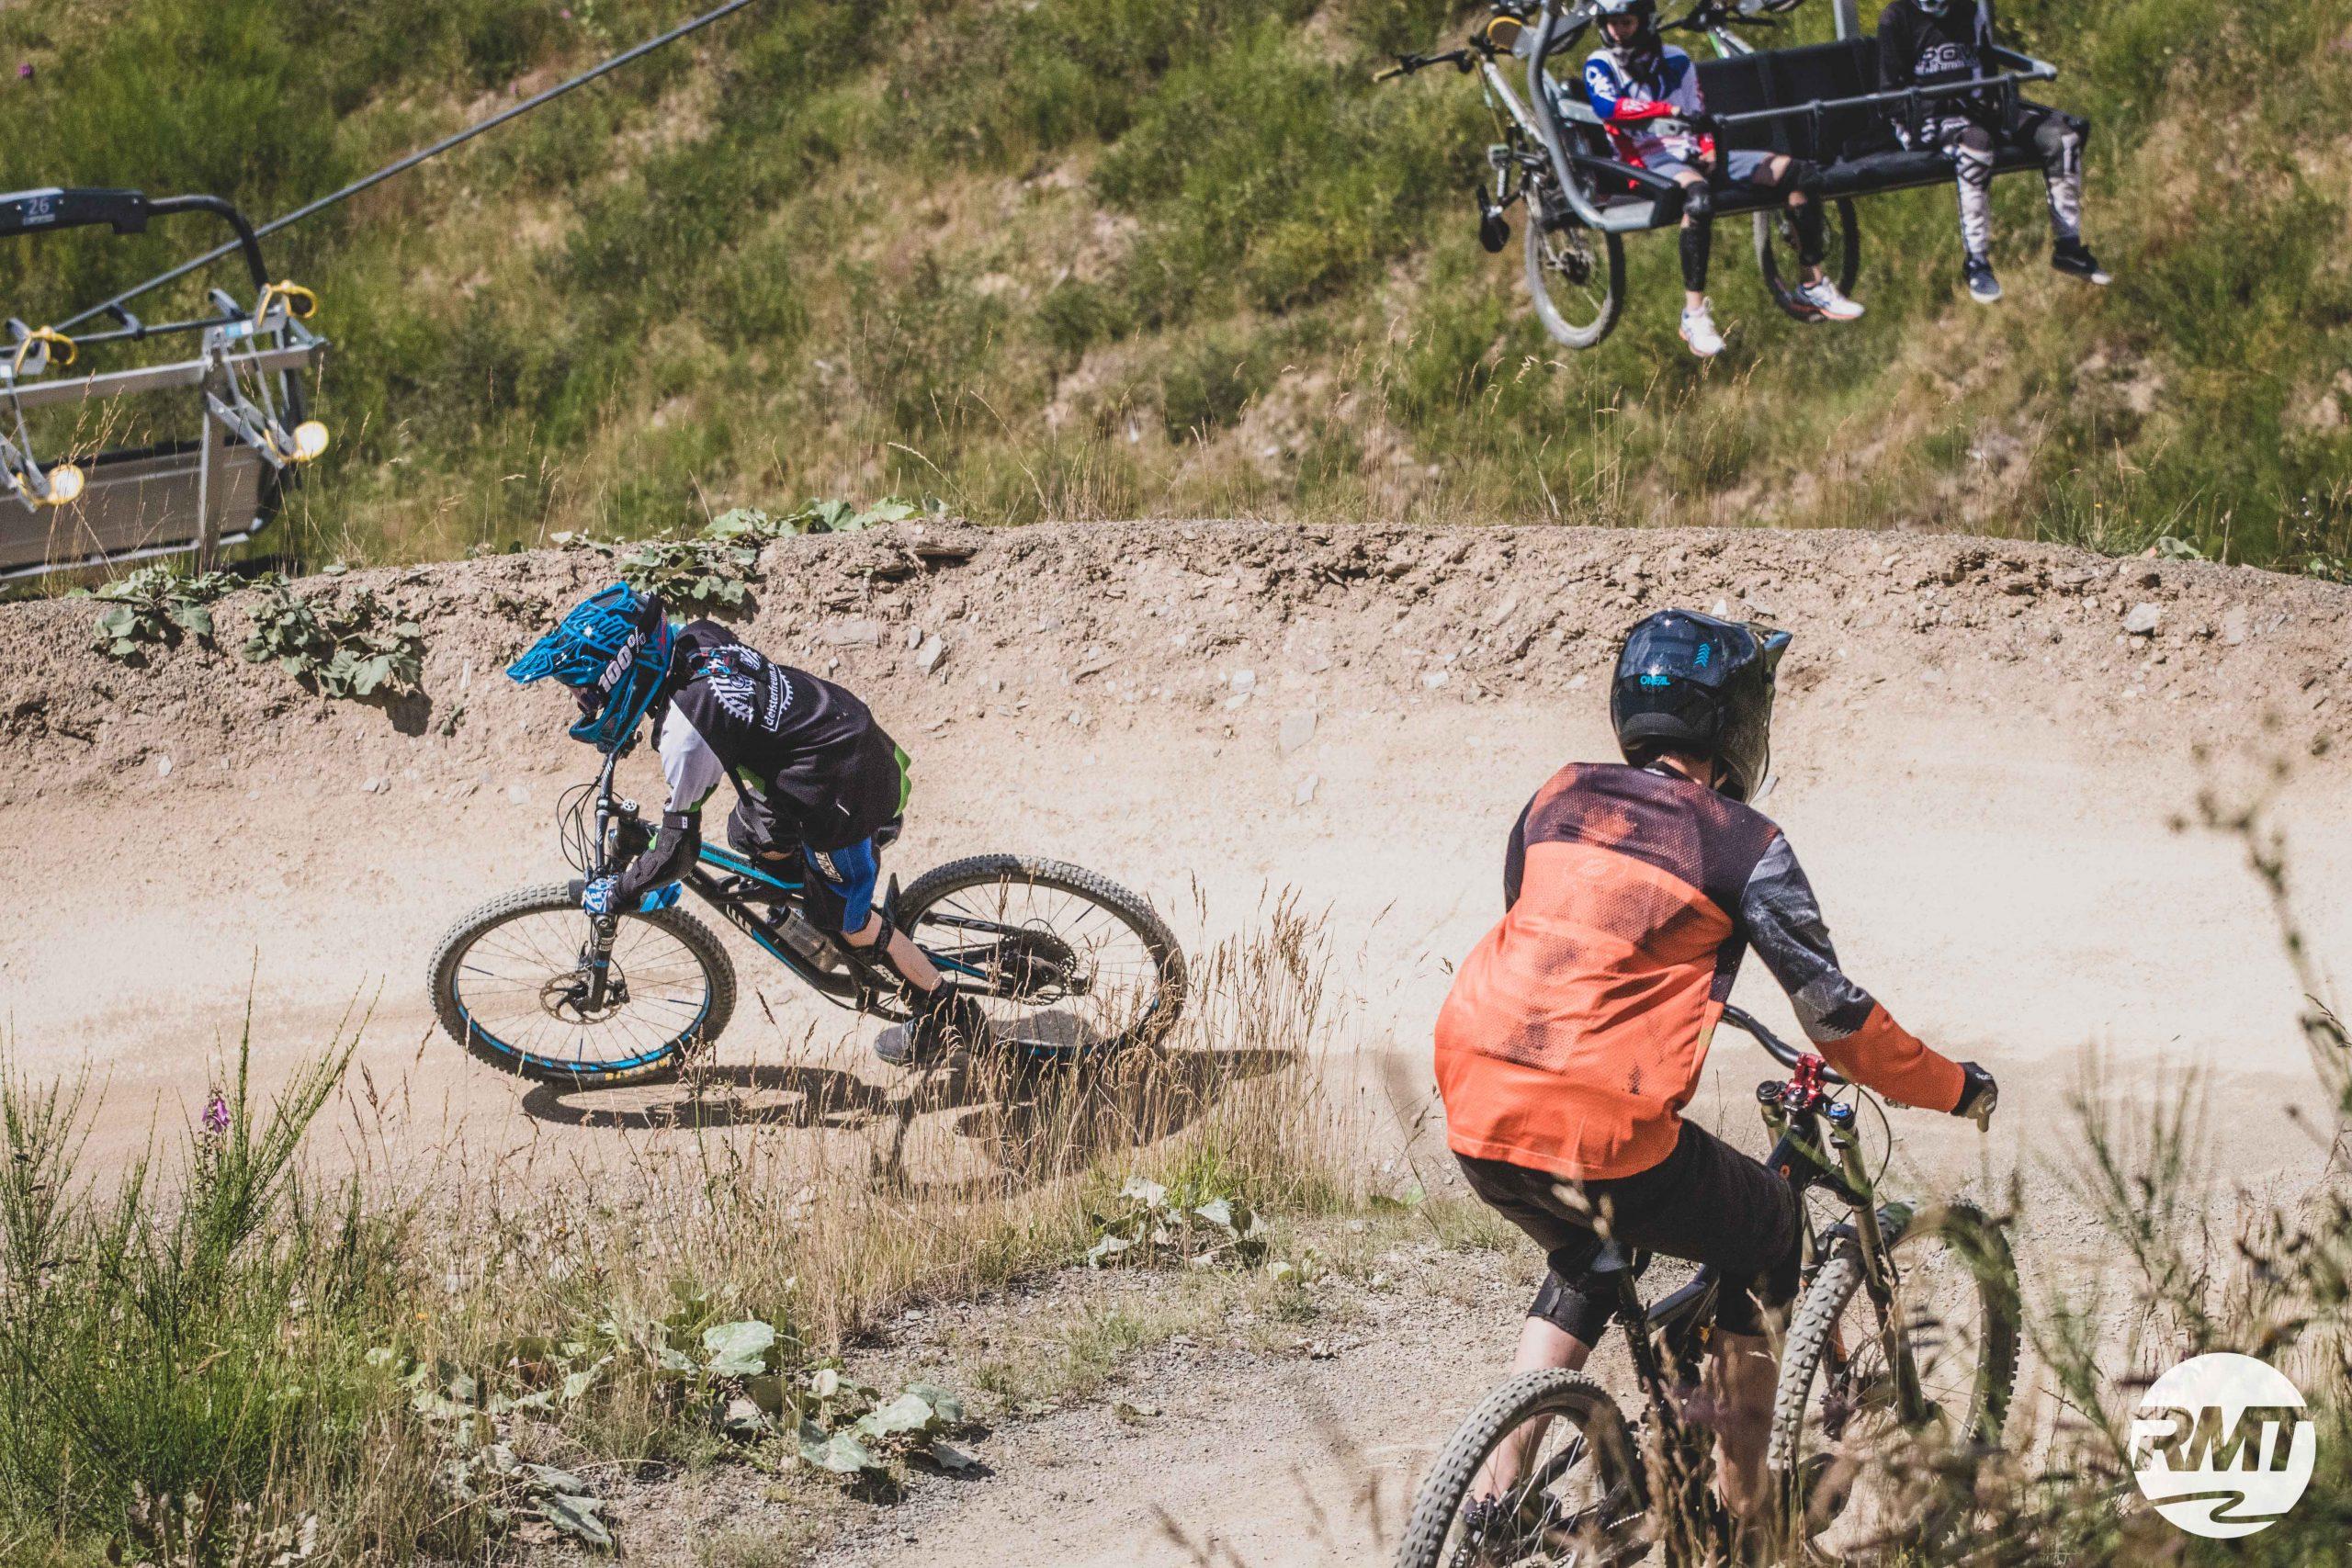 MTB Kinder Kurs Basic München Bikepark Samerberg - Fahrtechnik Training - Rock my Trail